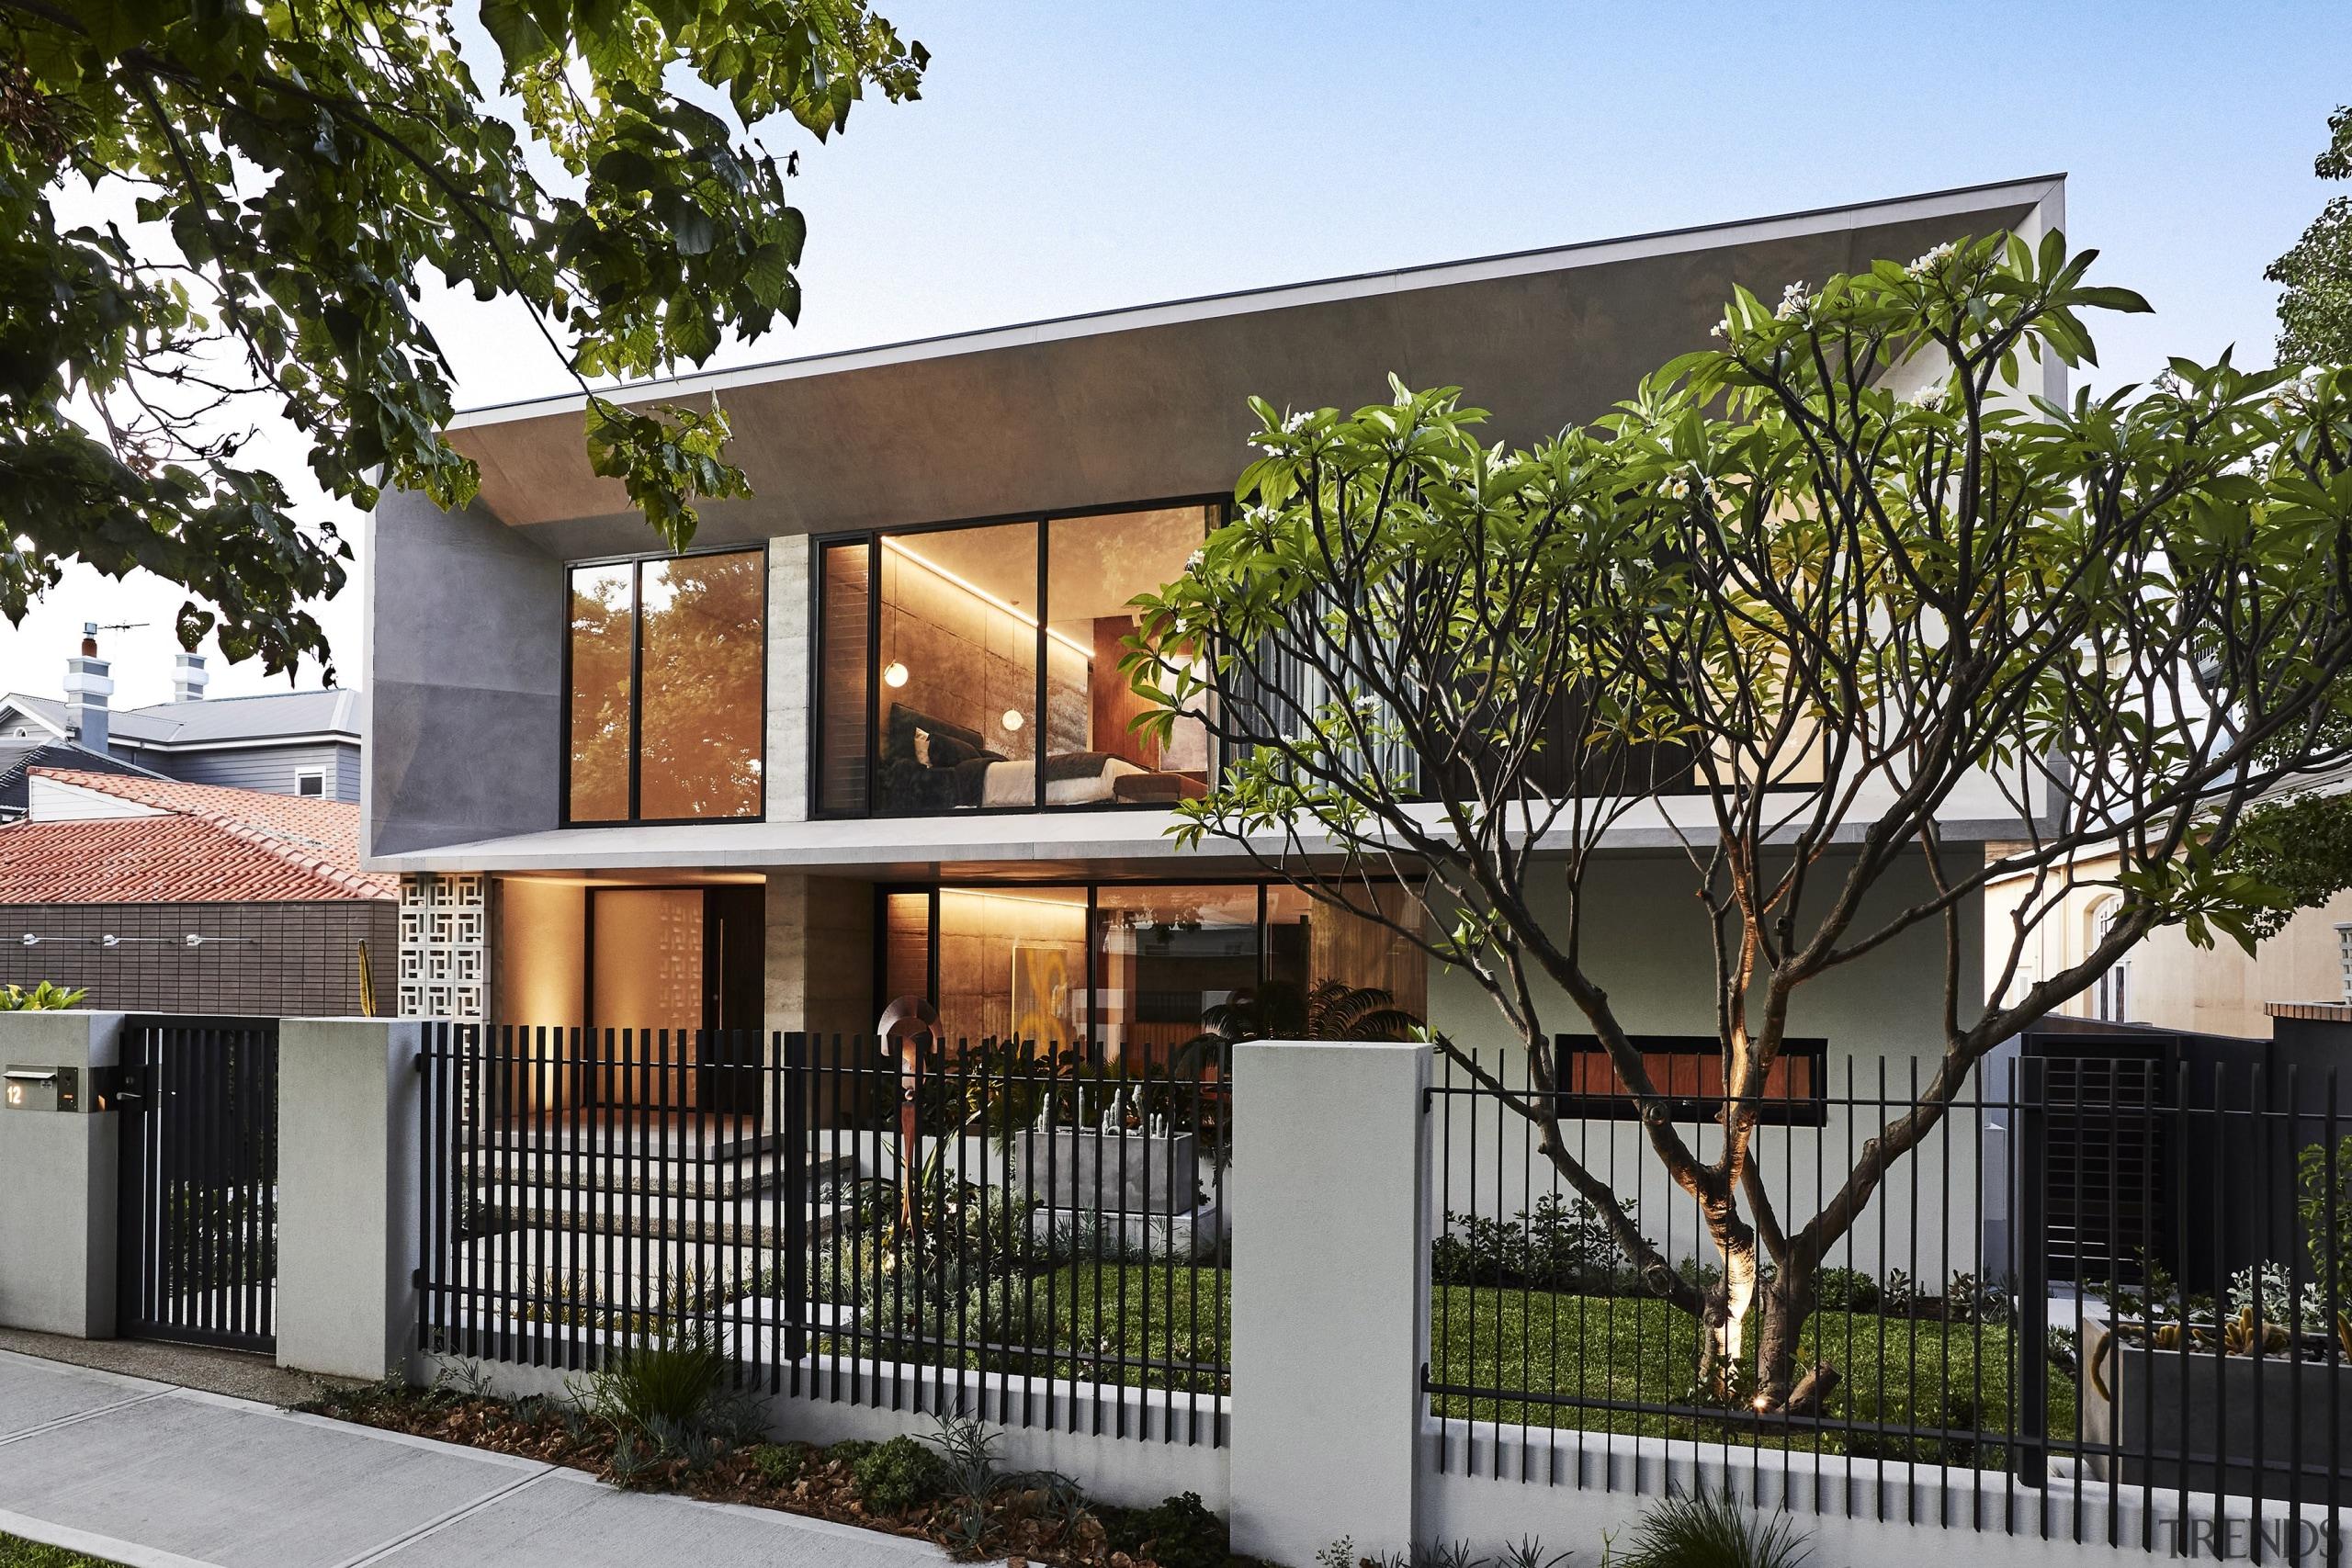 The home's design – facade included – responds